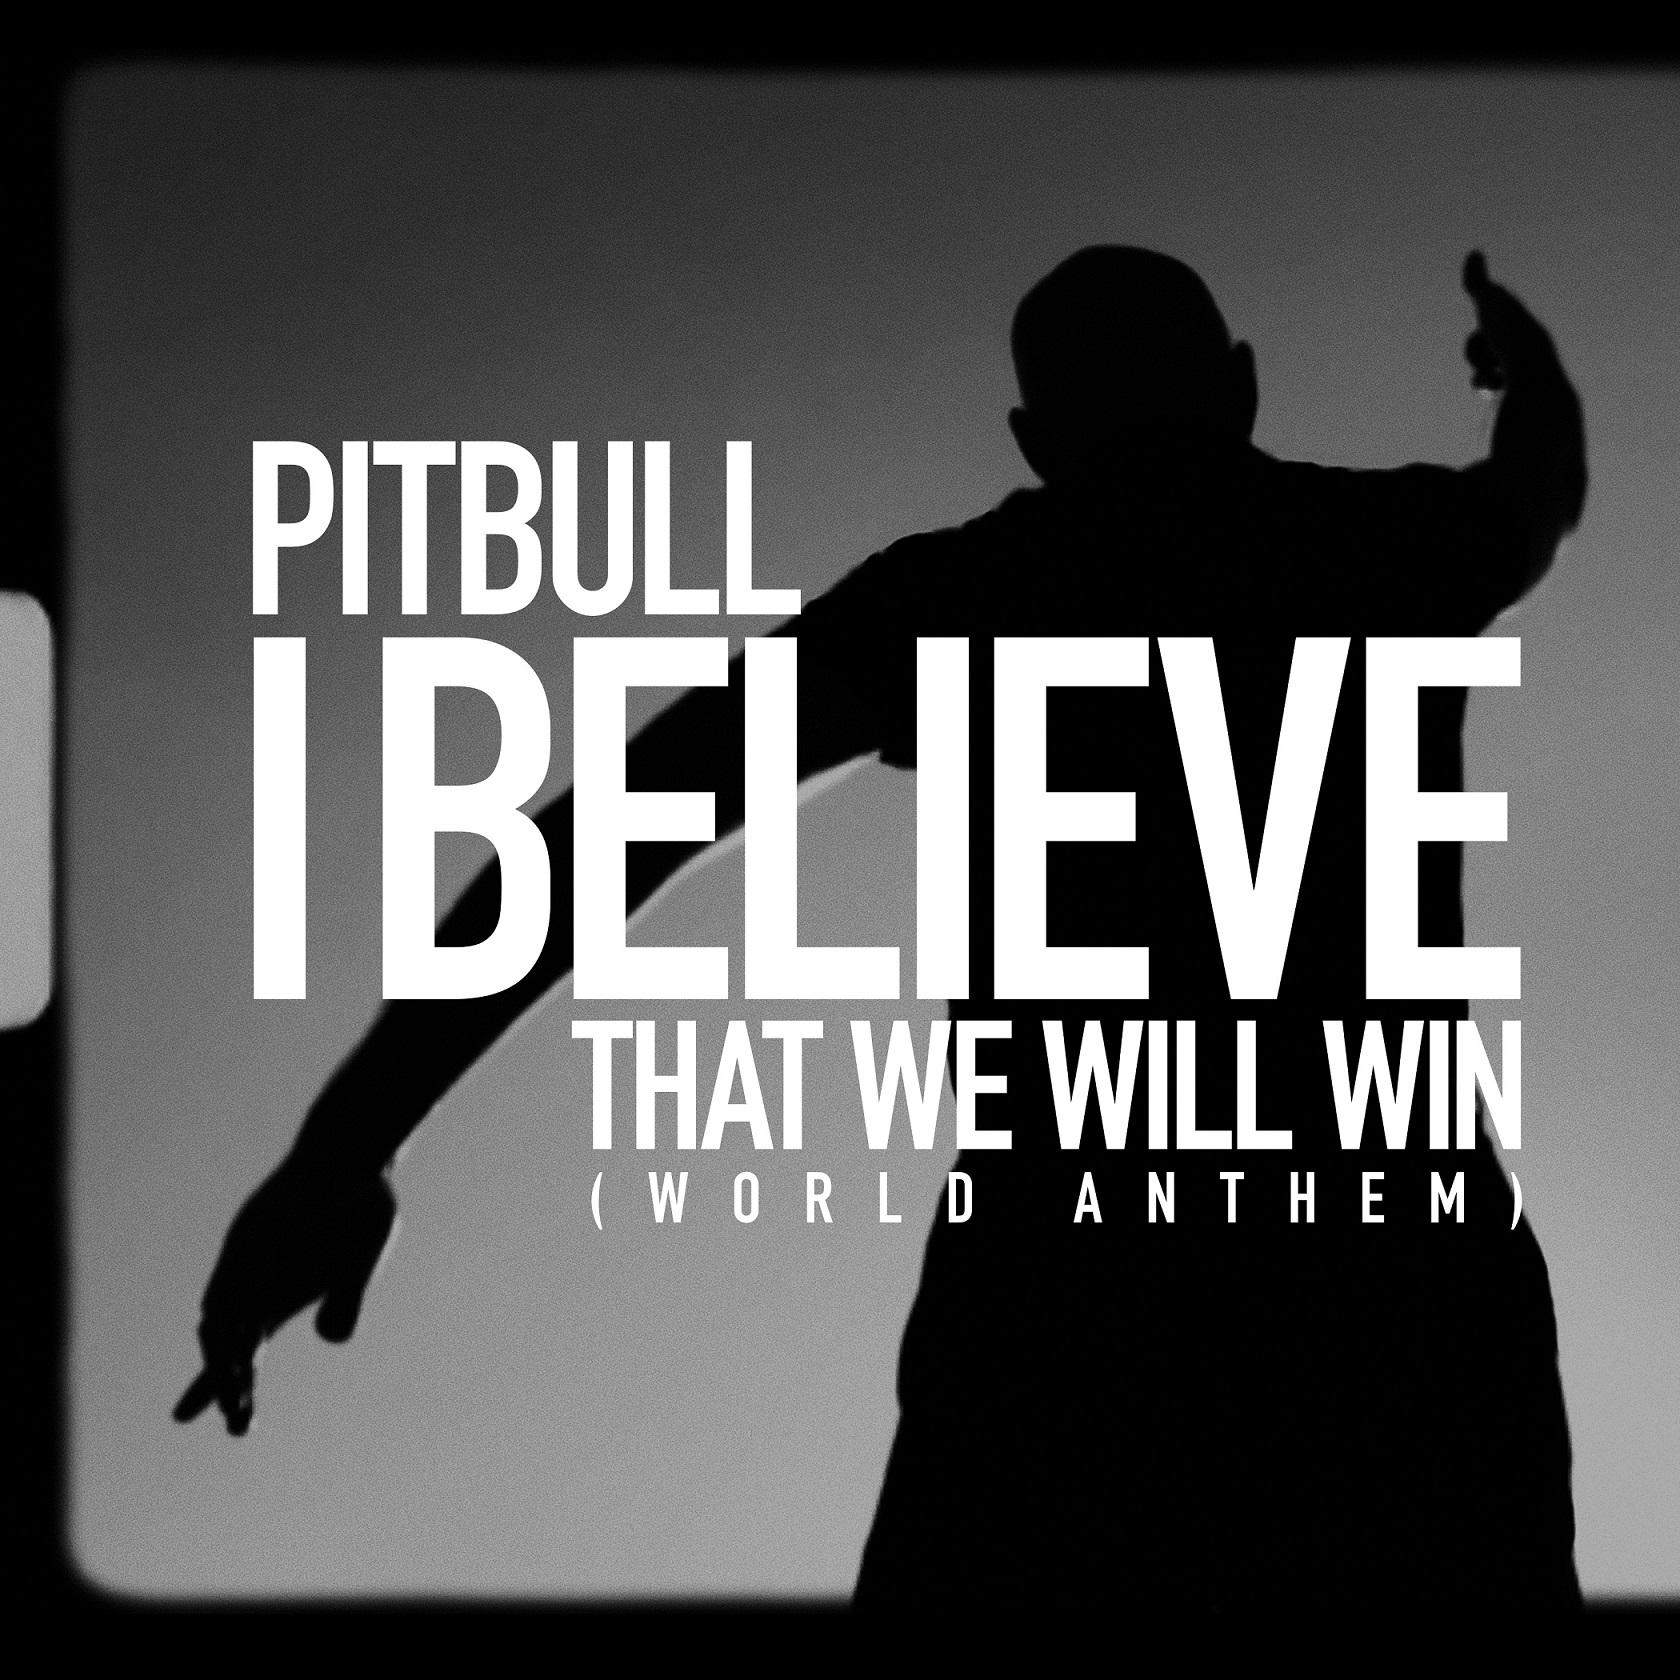 Pitbull vydáva hymnu proti pandémii!